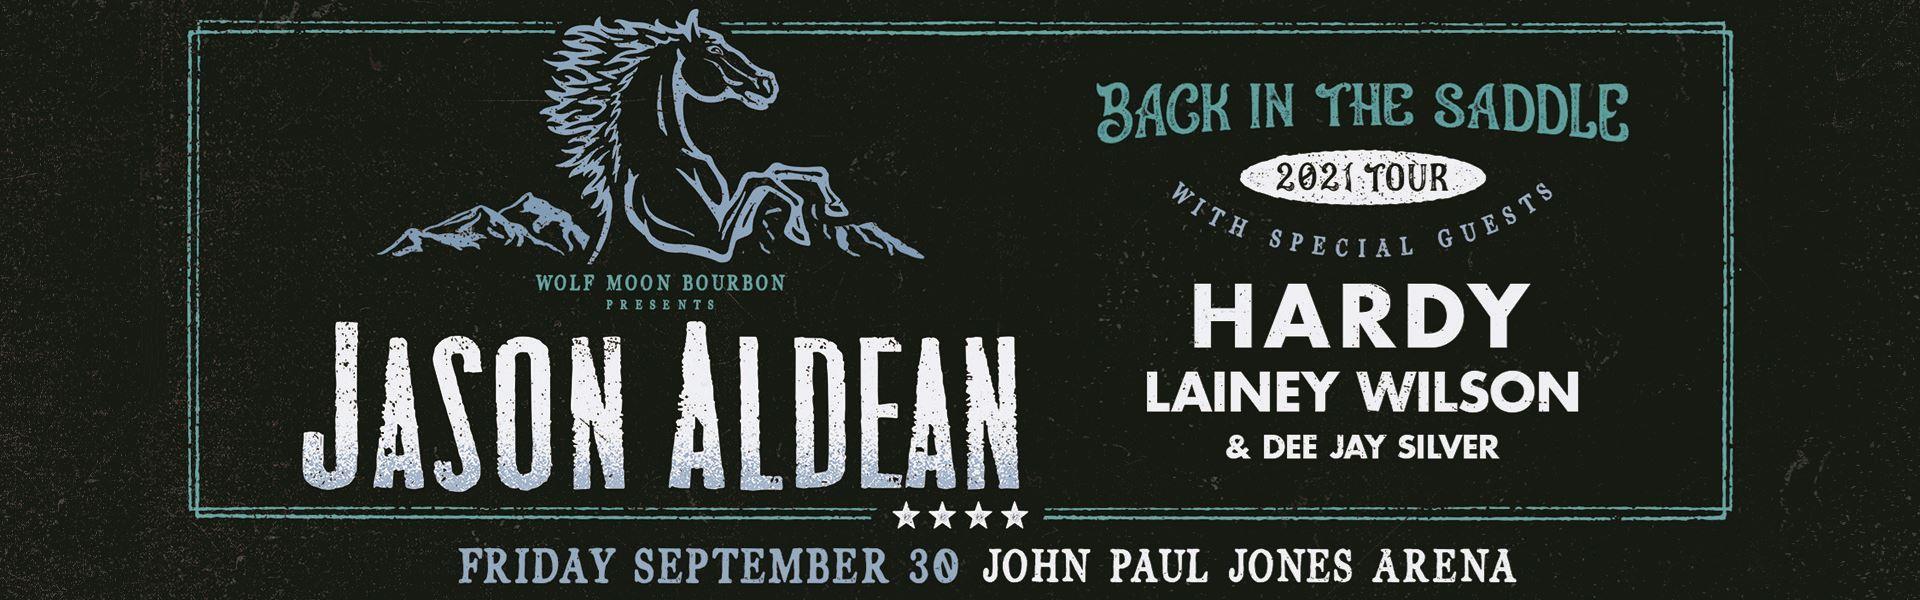 "JasonAldean ""Back In The Saddle Tour"": John Paul Jones Arena on Sept 30, 2022"